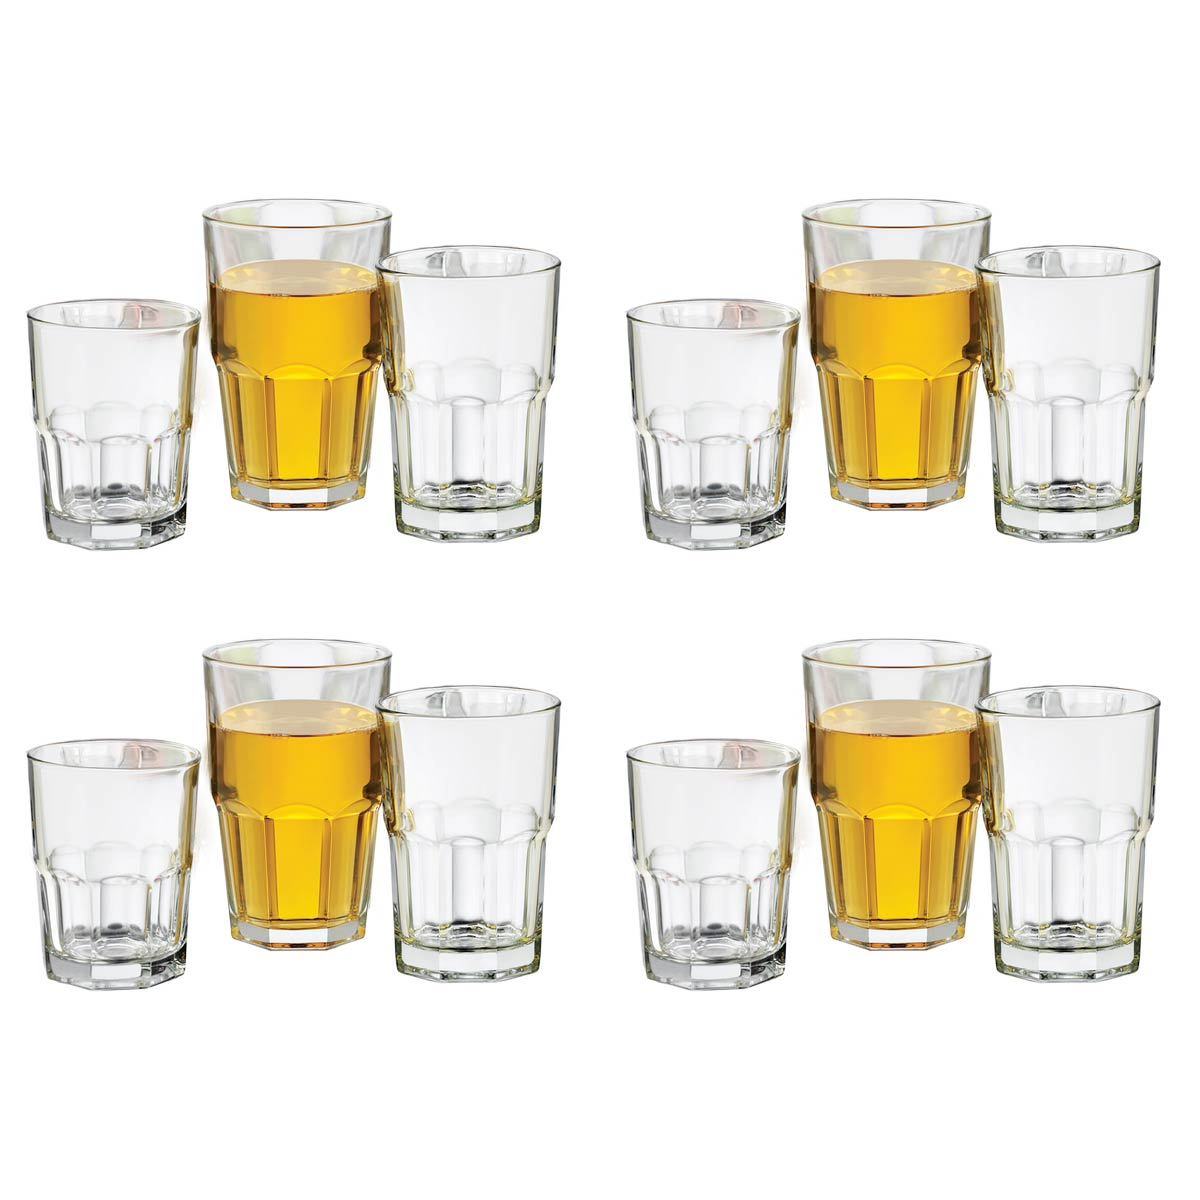 Juego Vasos Boston Vidrio 12Pzas Whisky Cocina Bar Libbey